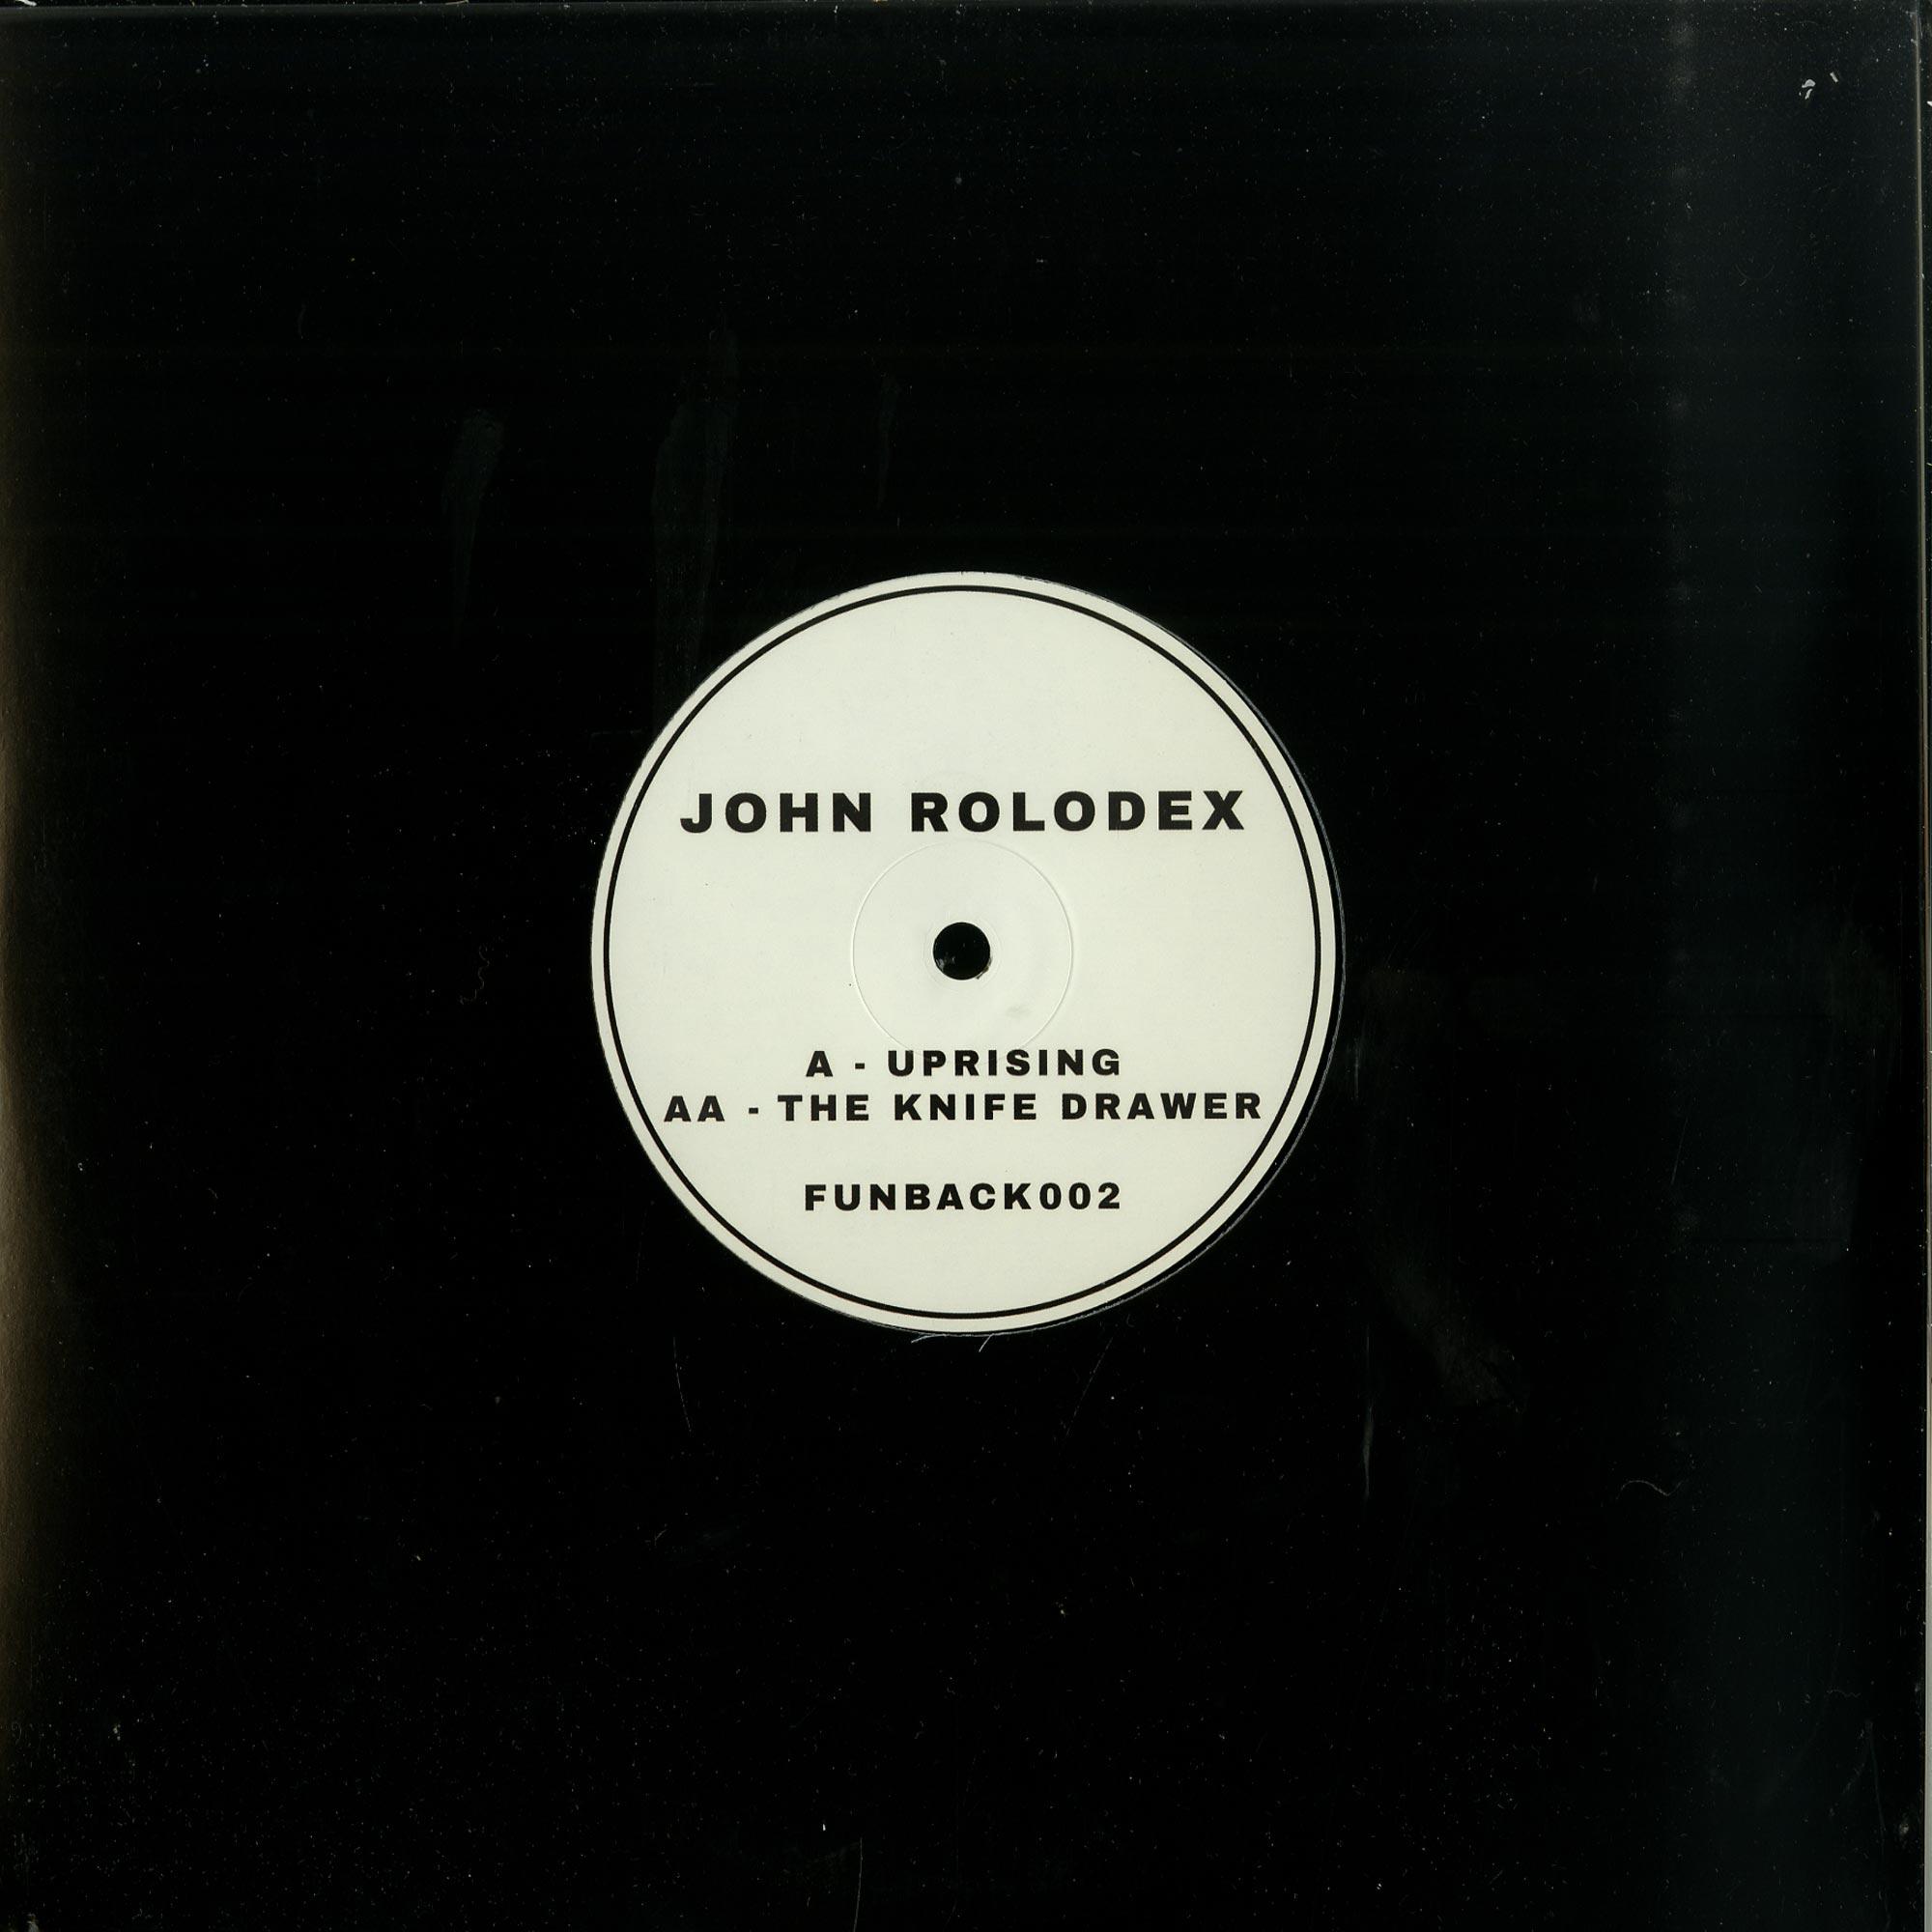 John Rolodex - FUNBACK002